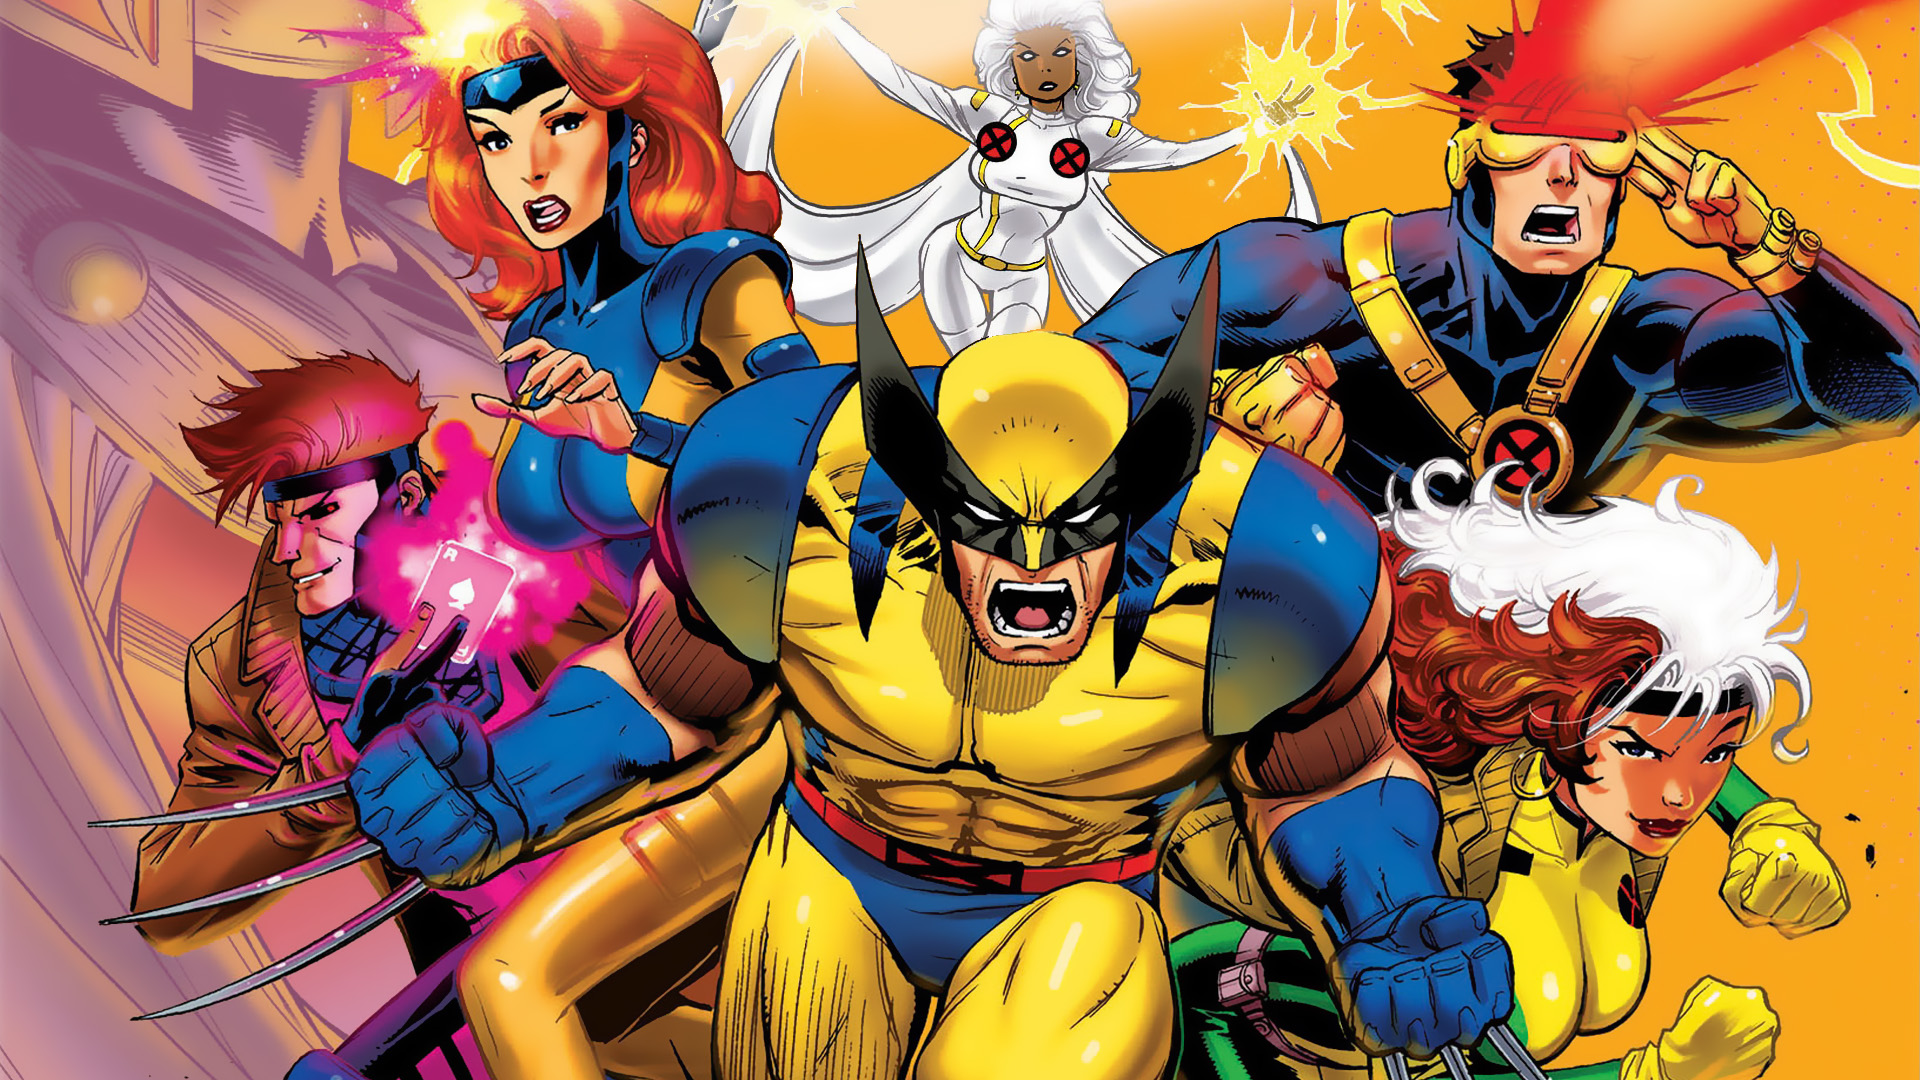 'X-Force' Delayed by 'X-Men: Apocalypse'